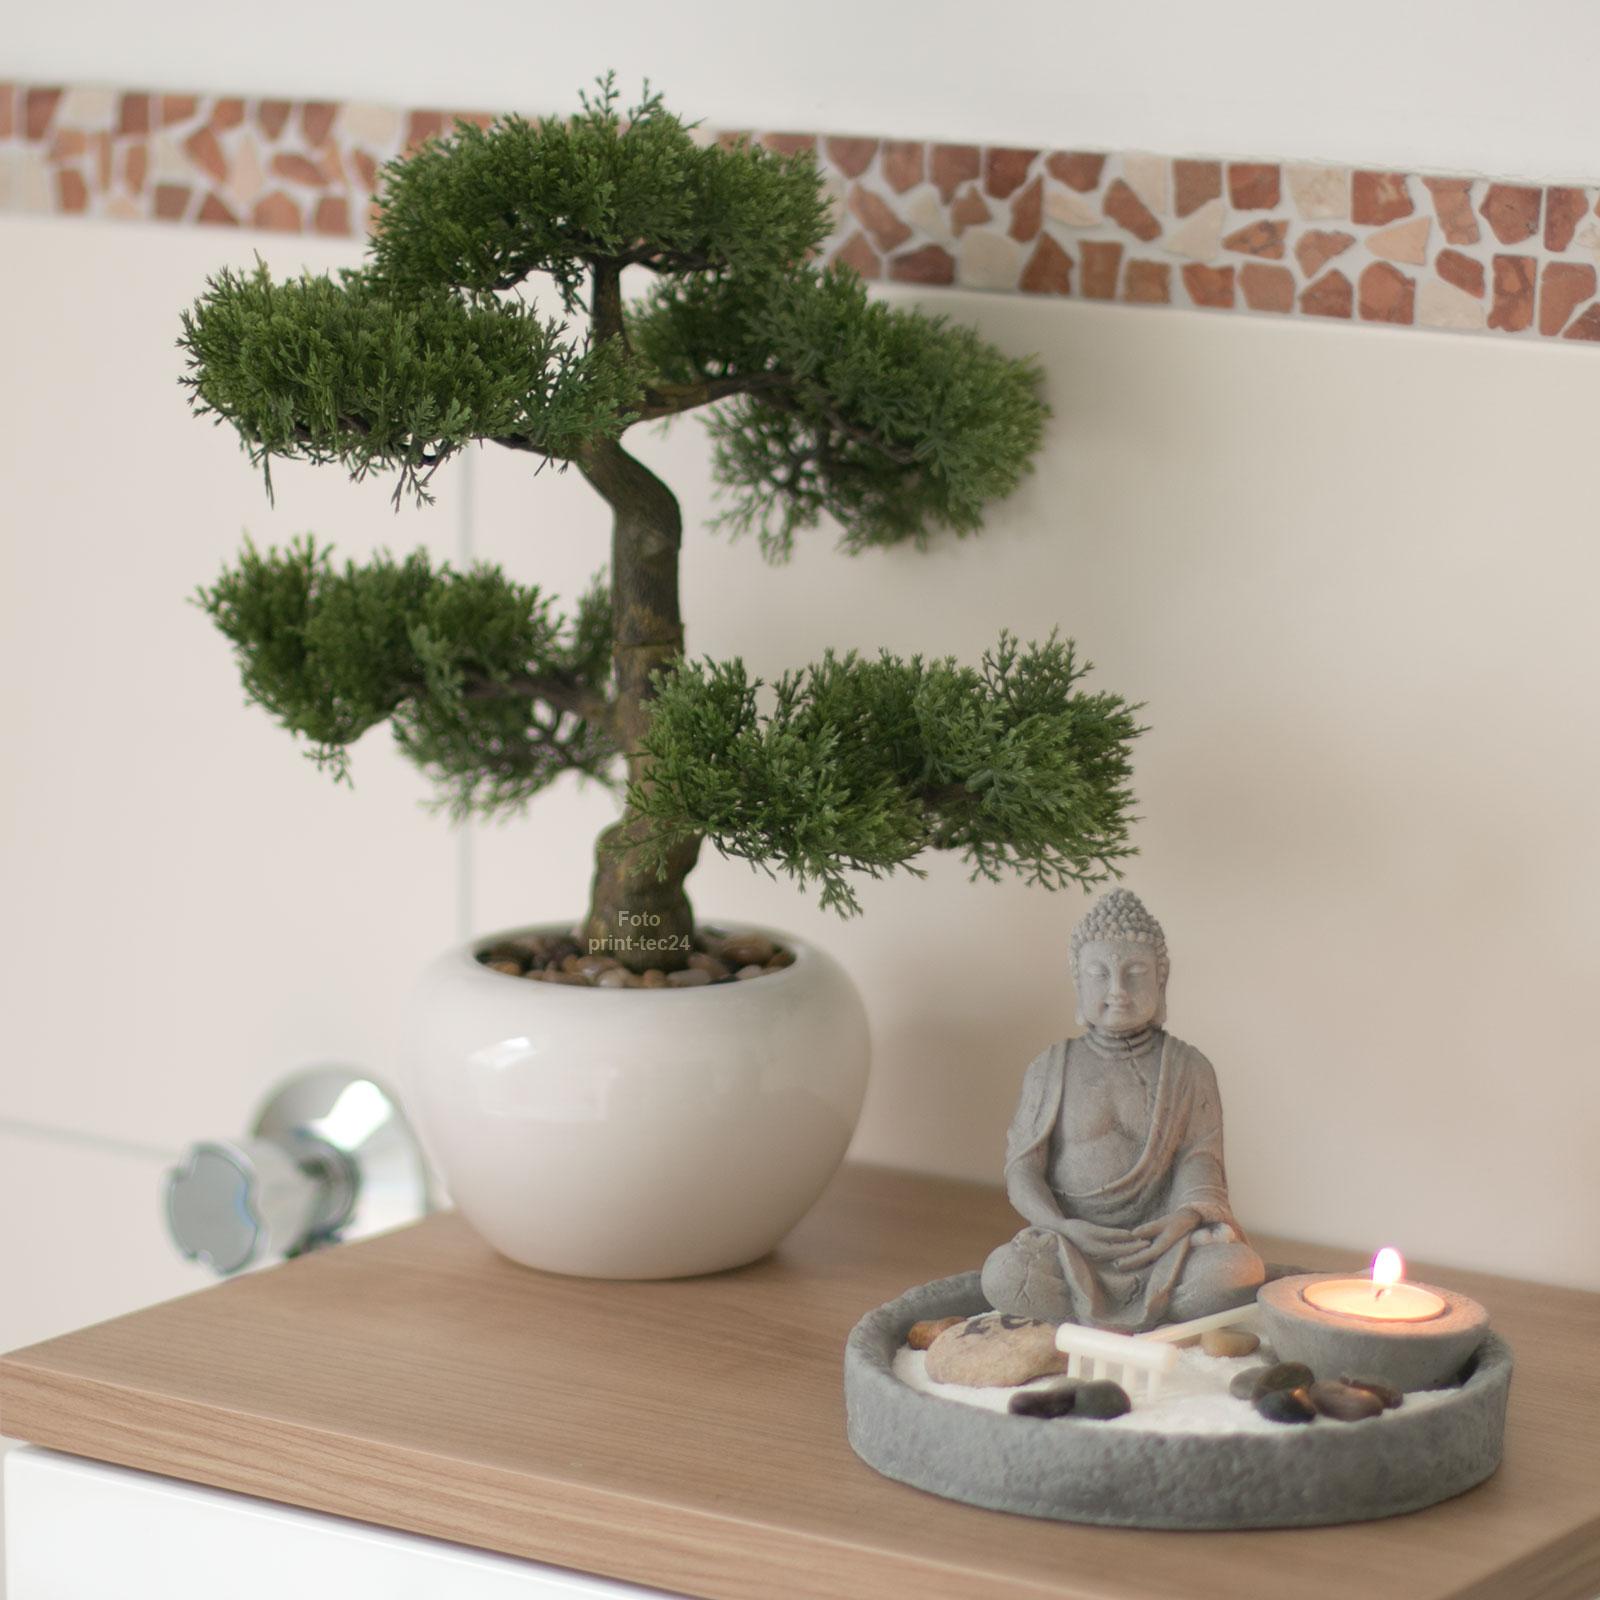 K nstliches bonsai b umchen topf kunstpflanze - Bonsai zimmerpflanze ...